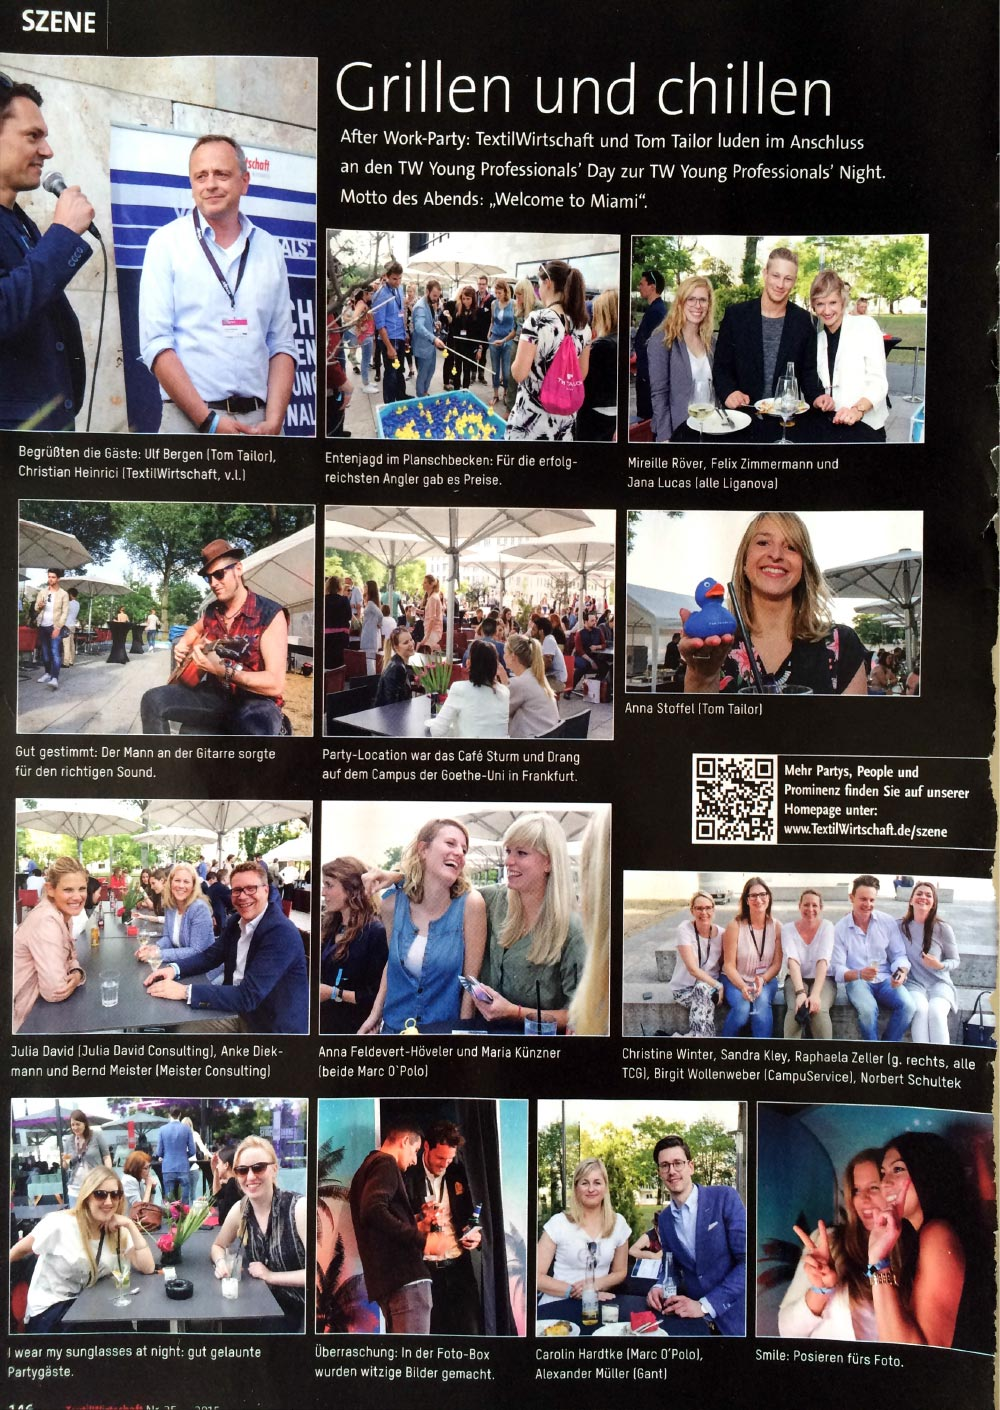 Julia_David_Coaching_Textilwirtschaft_Young_Professionals_Day-2015-3